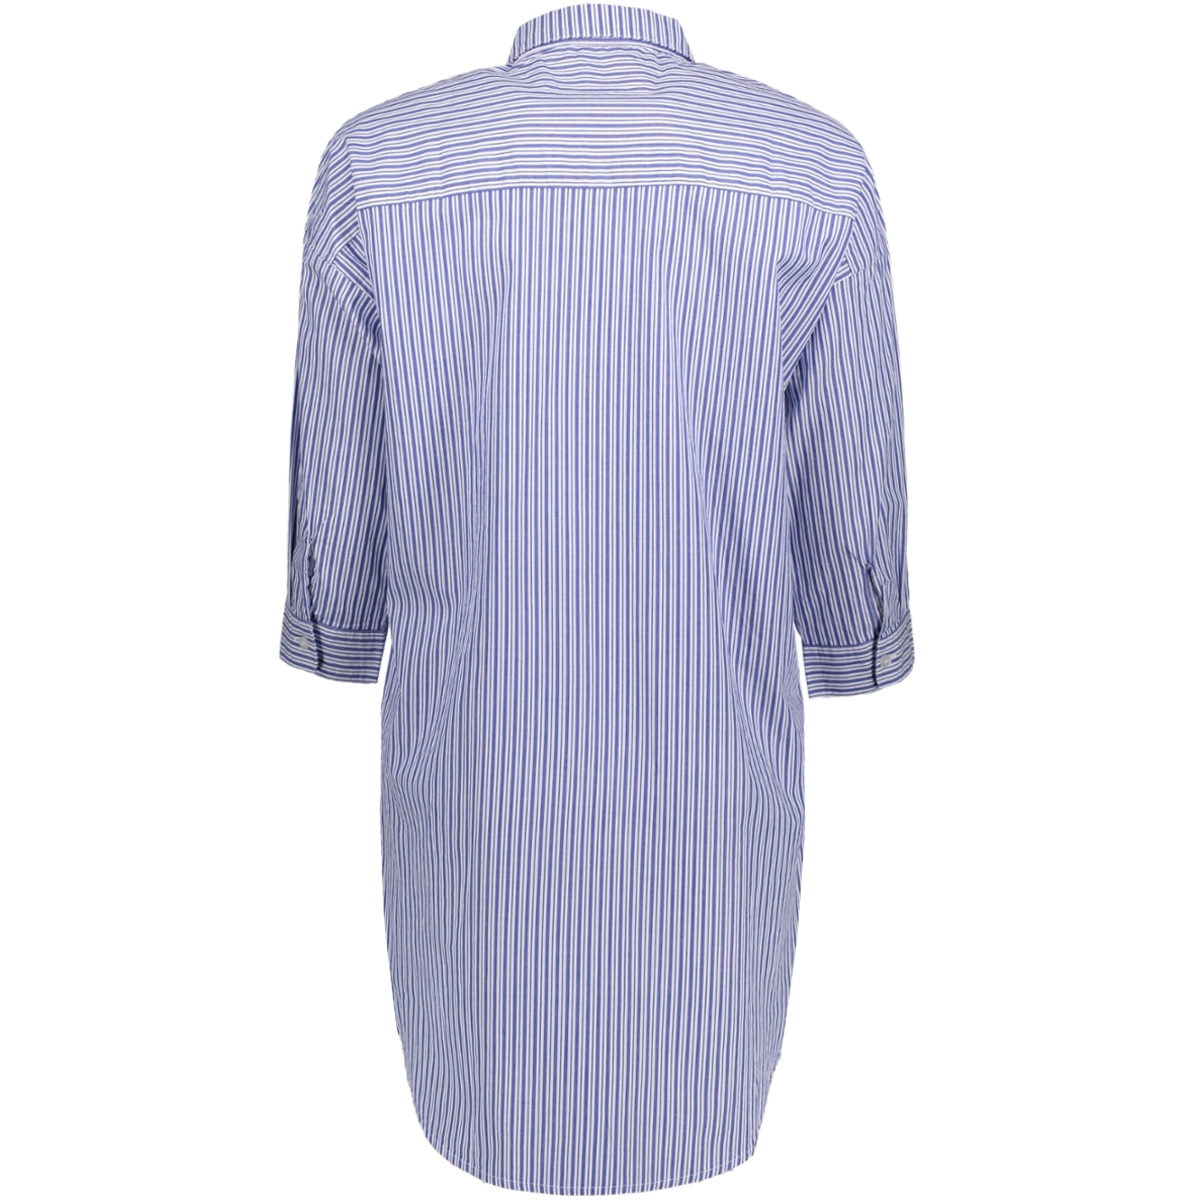 jdybless 3/4 long shirt wvn 15138879 jacqueline de yong blouse white/light blue